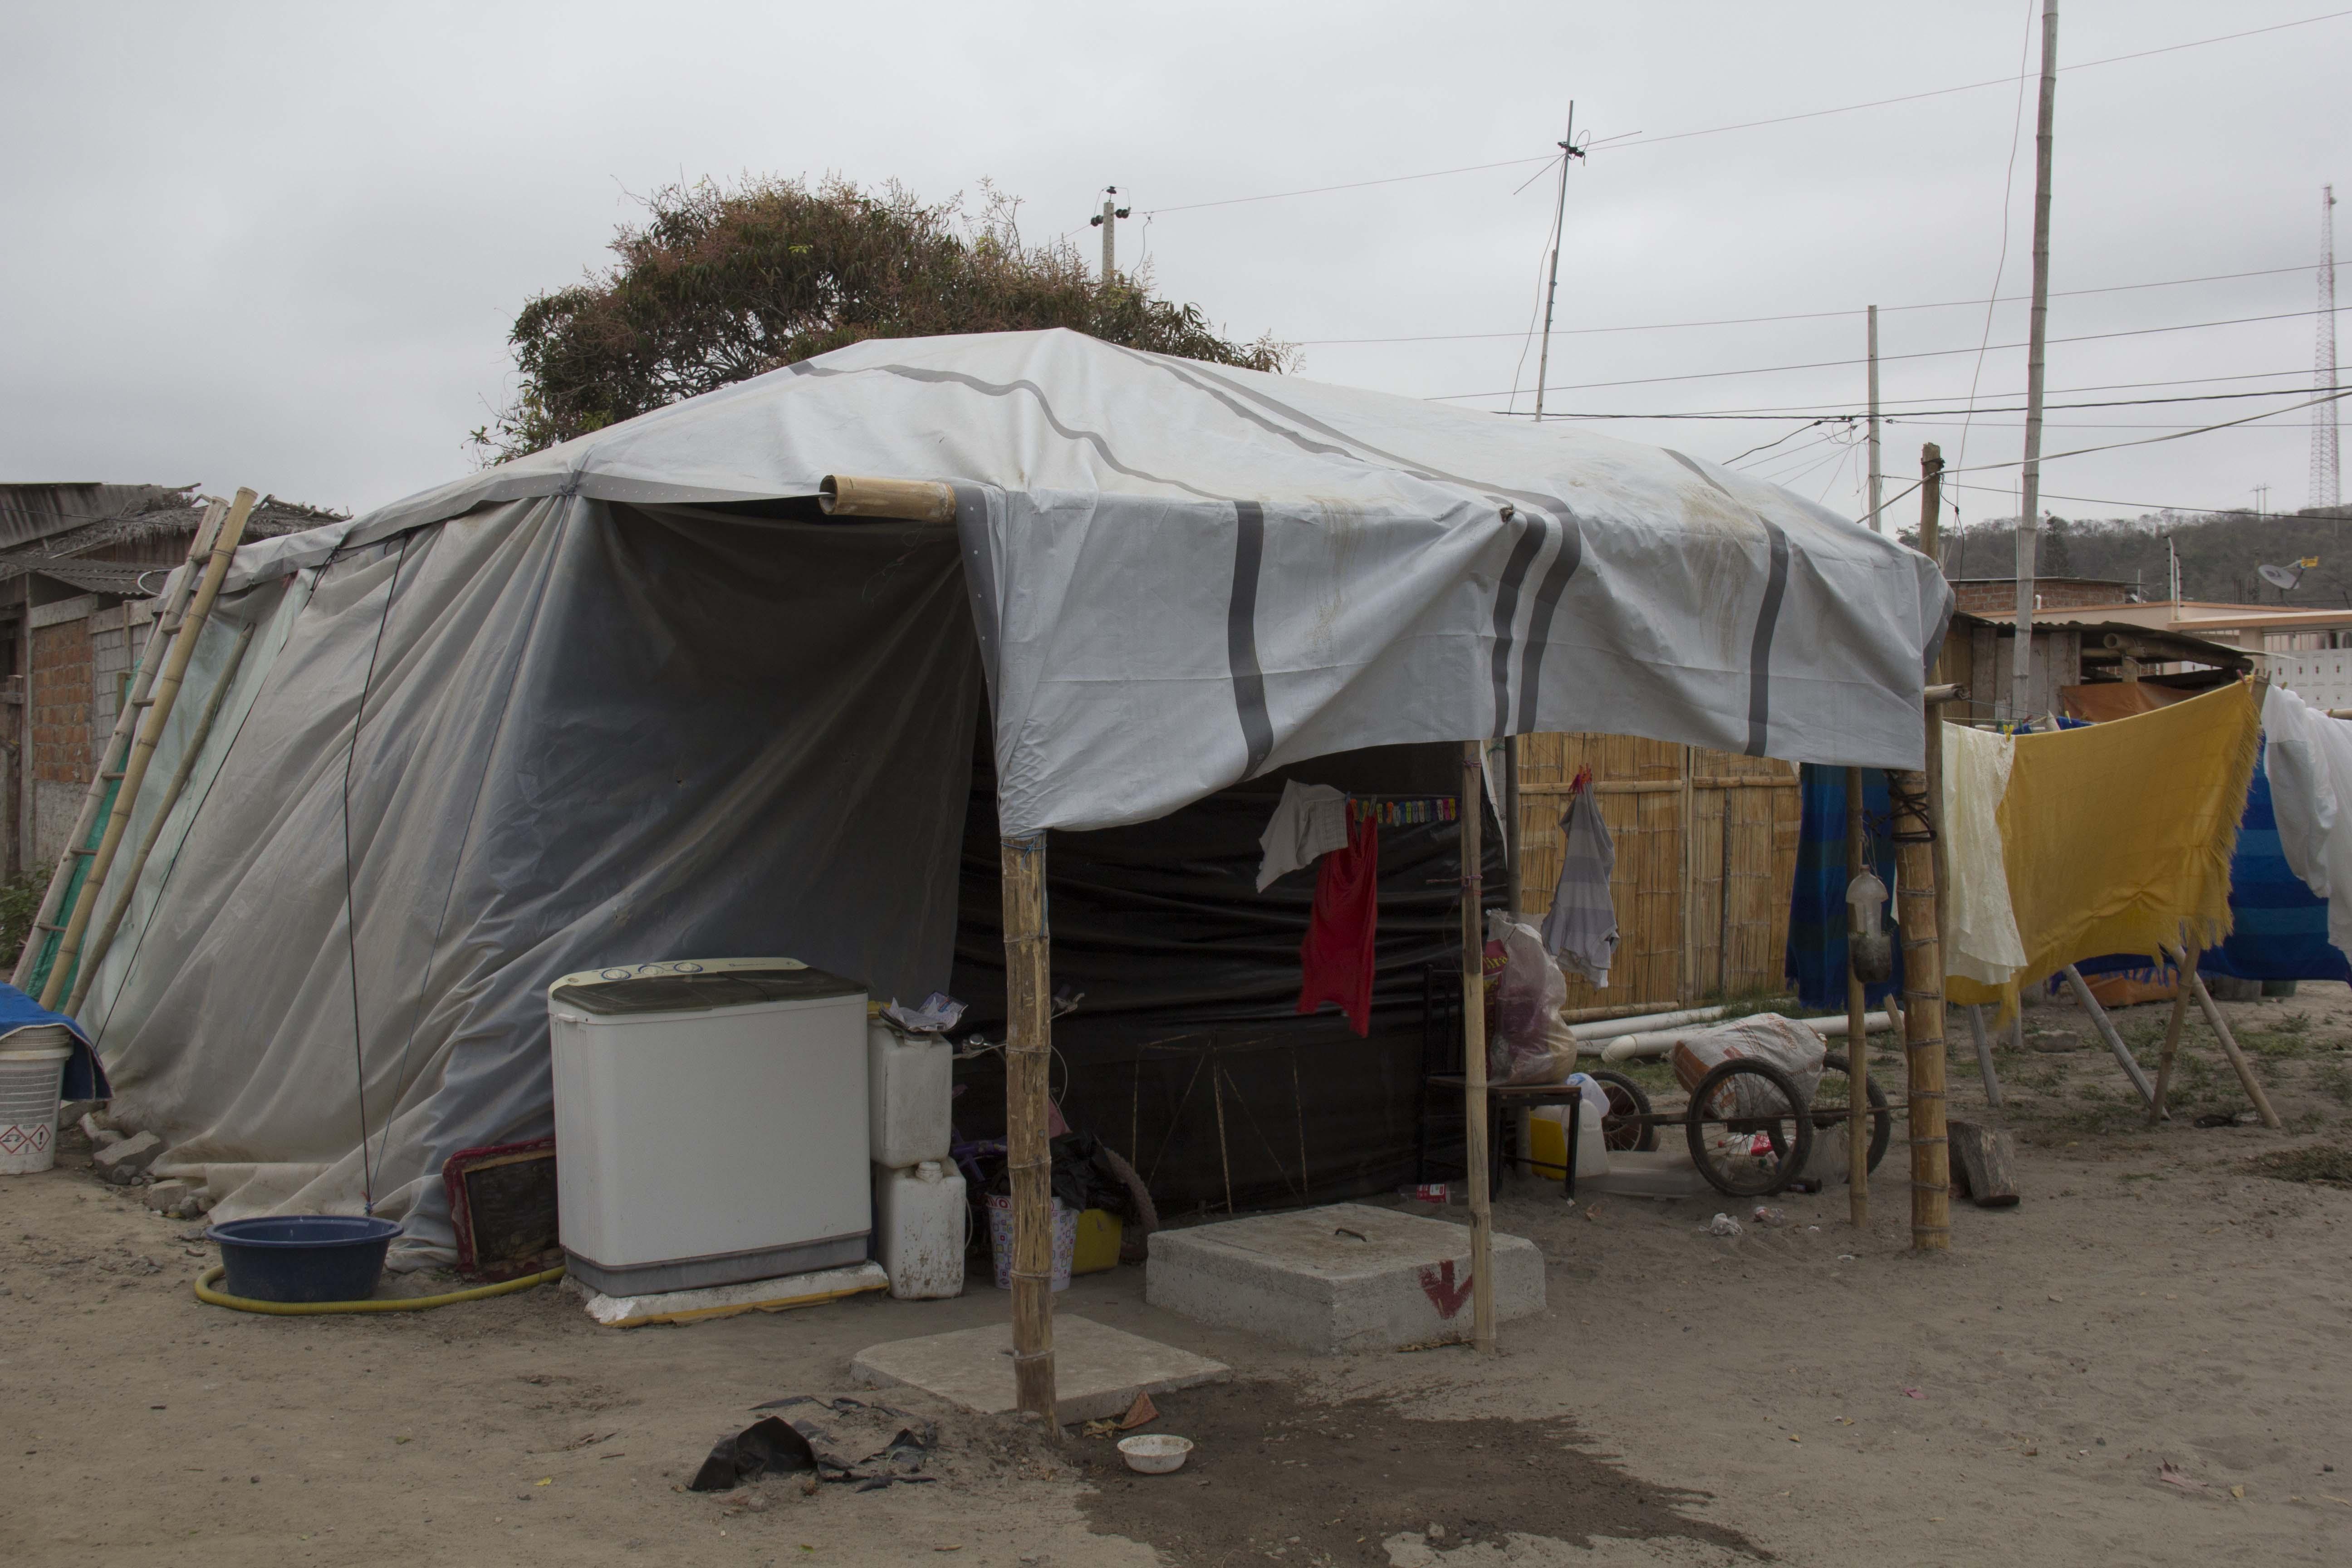 refugee home at Ecuador in 2016